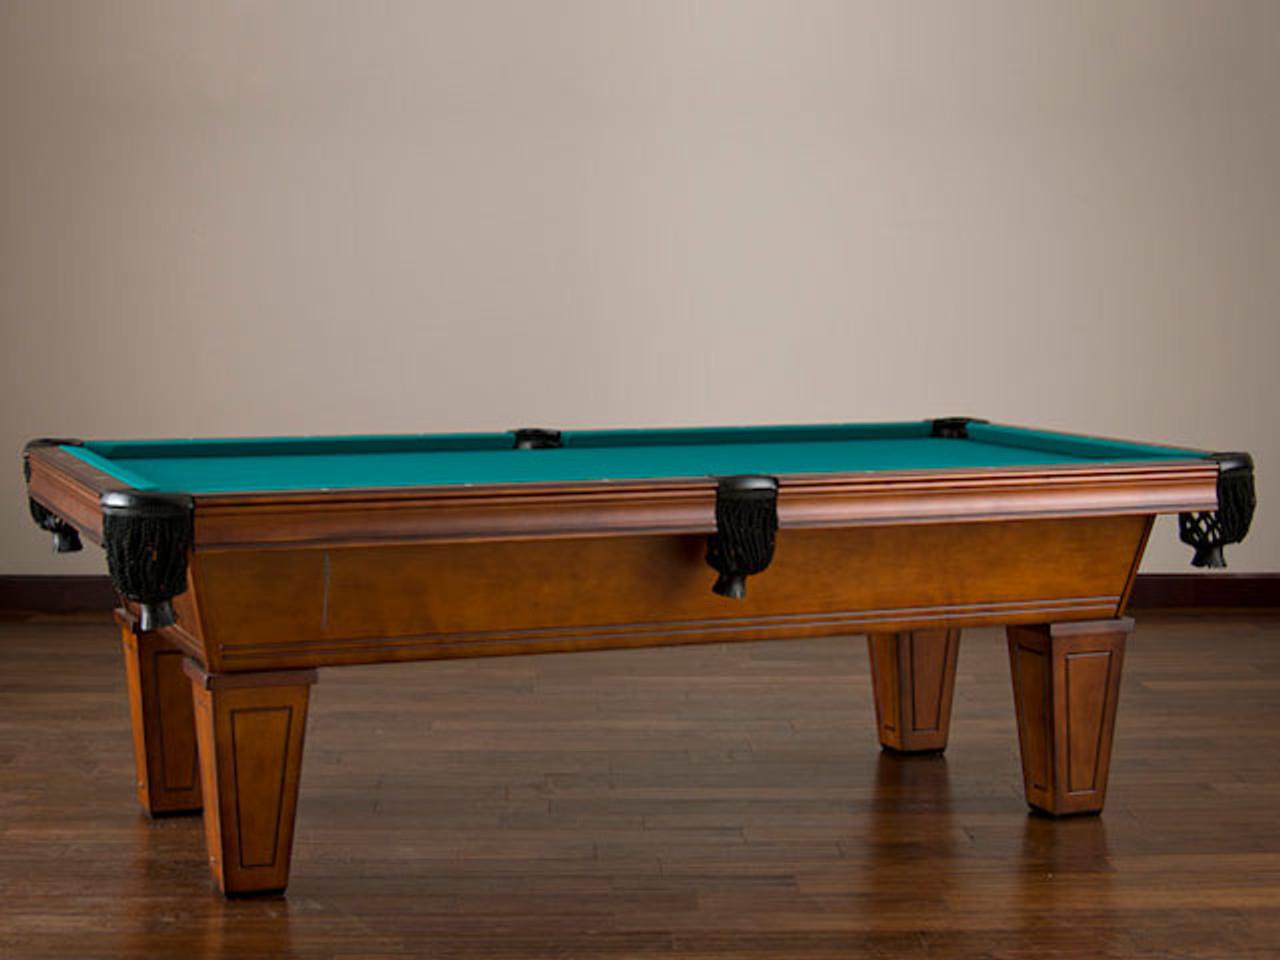 American Heritage Billiards Avon The Pool Table Store - American heritage artero pool table